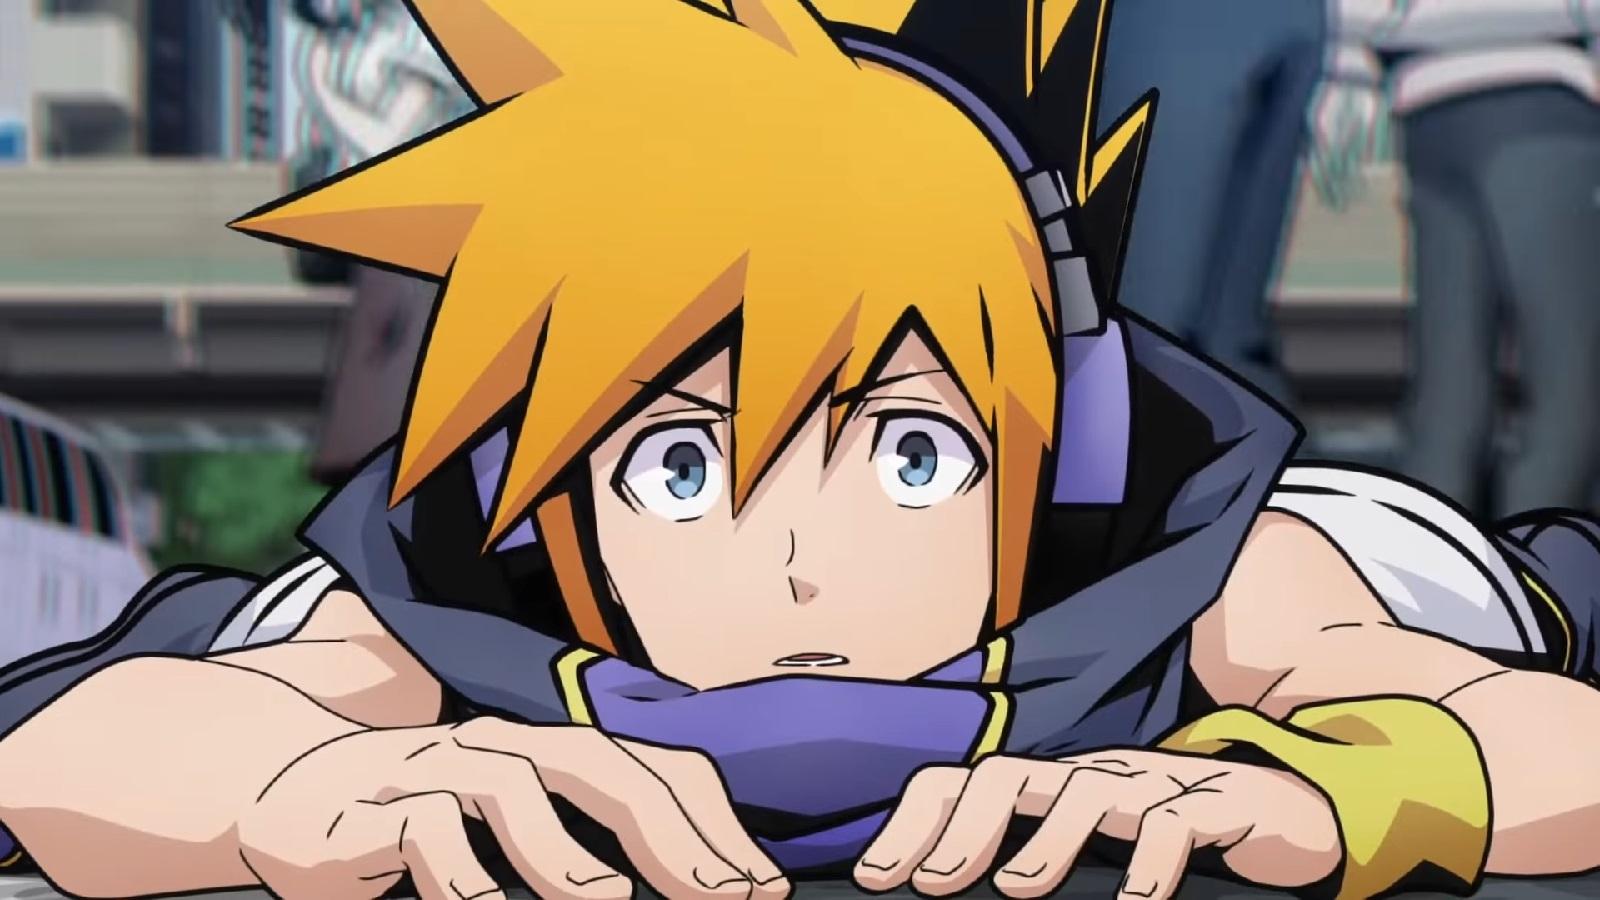 Square Enix запустила обратный отсчёт до анонса, связанного с The World Ends With You